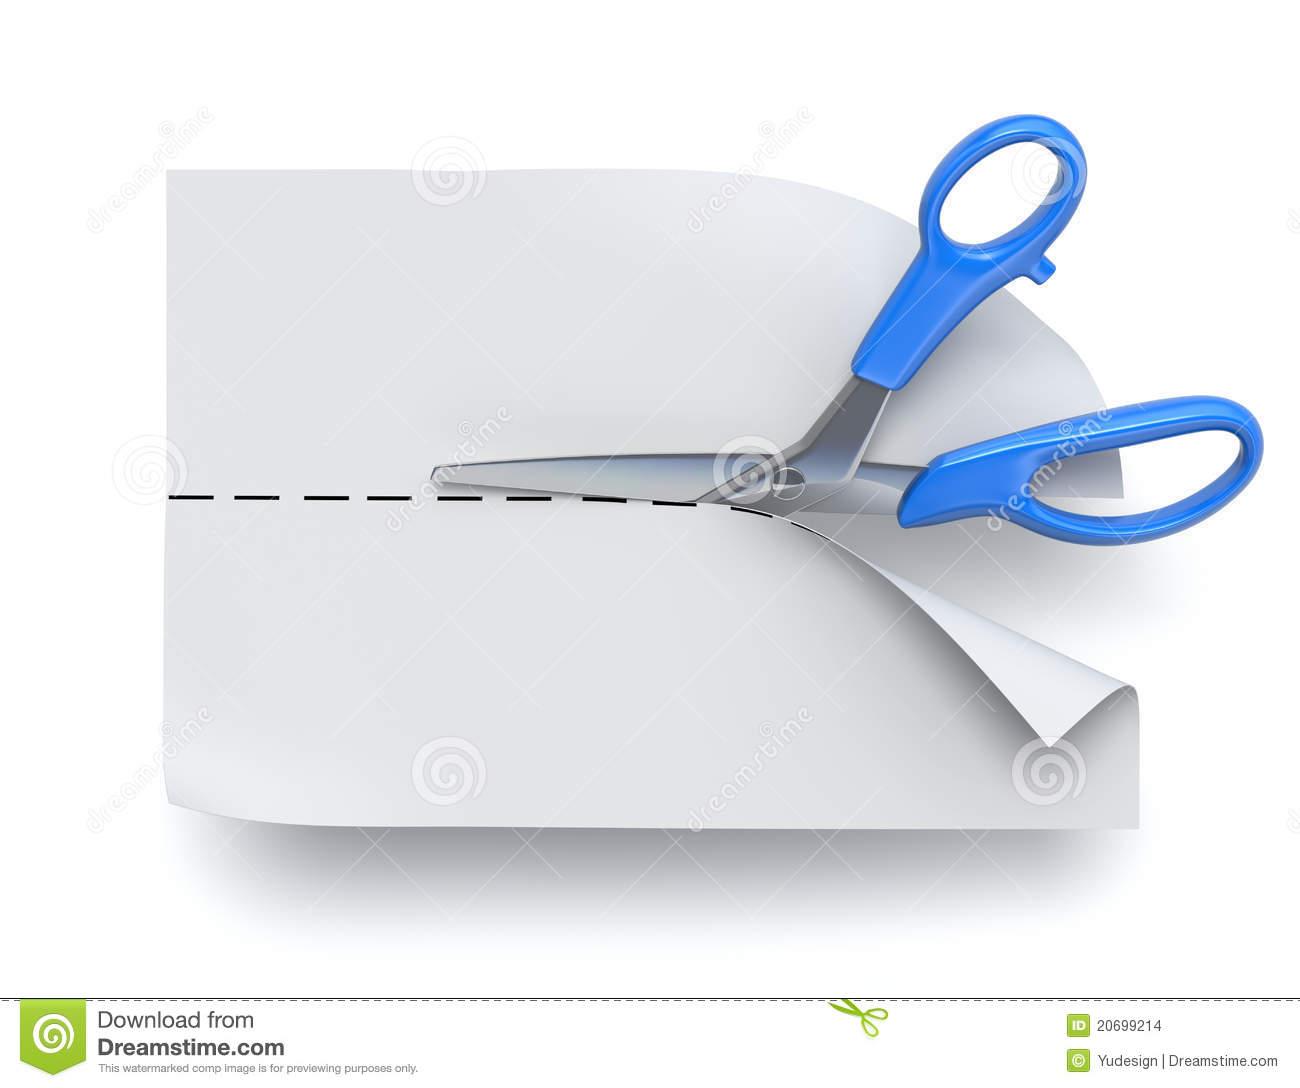 Scissors cutting paper stock illustration. Illustration of page.